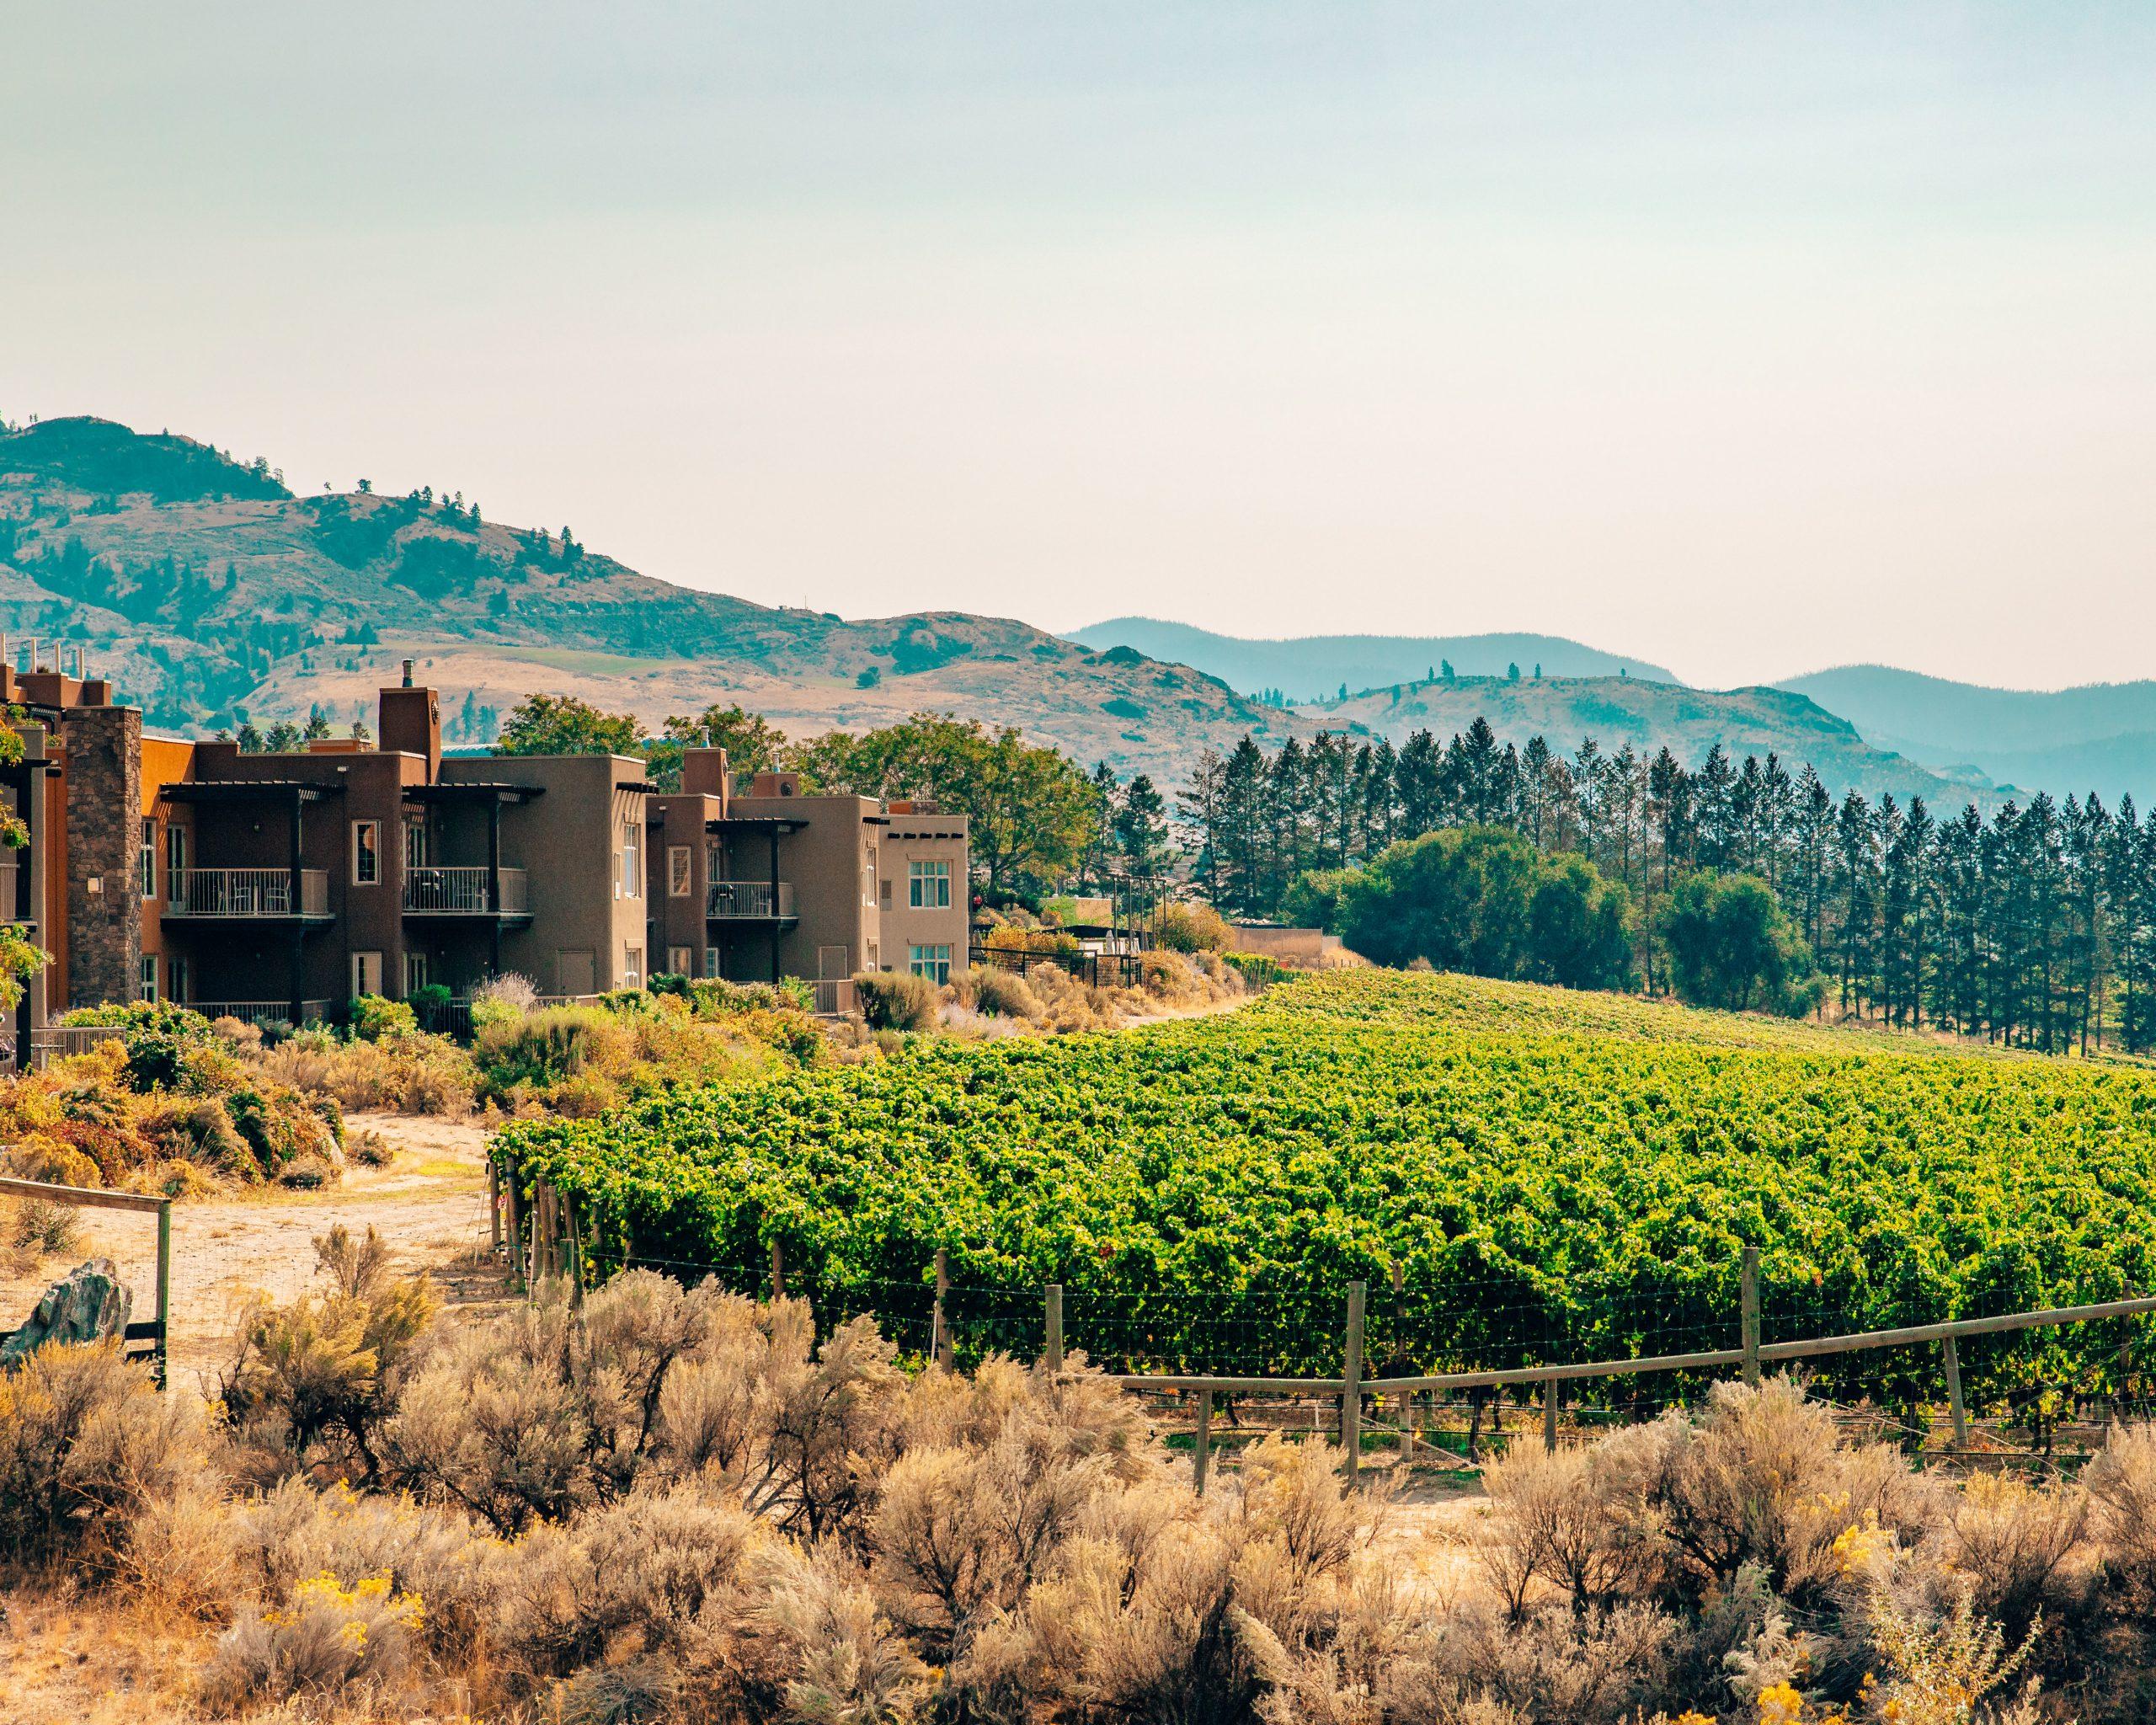 Nk'Mip Cellars Wine Tasting British Columbia